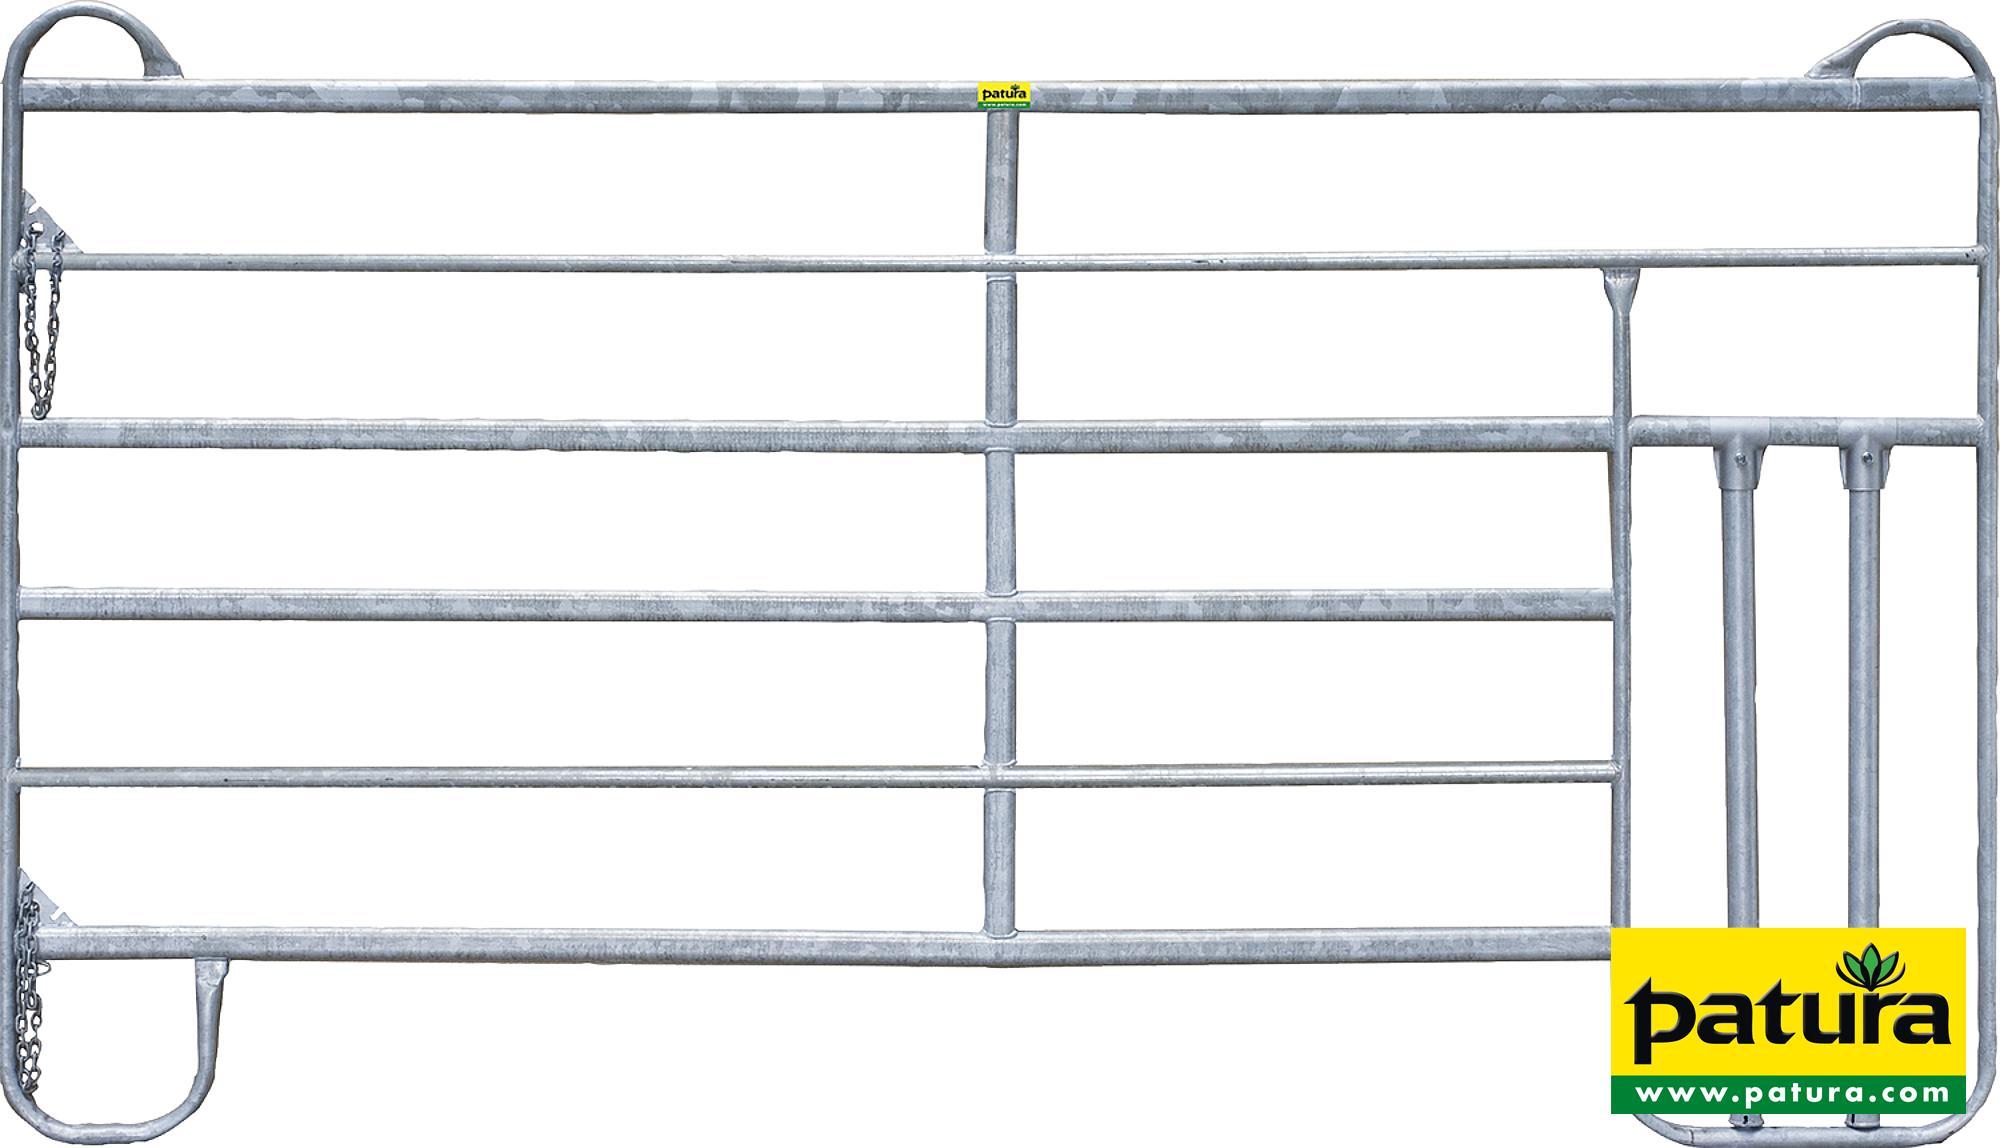 Panel-6 mit Kälberschlupf Länge 3,00 m, Höhe 1,70 m